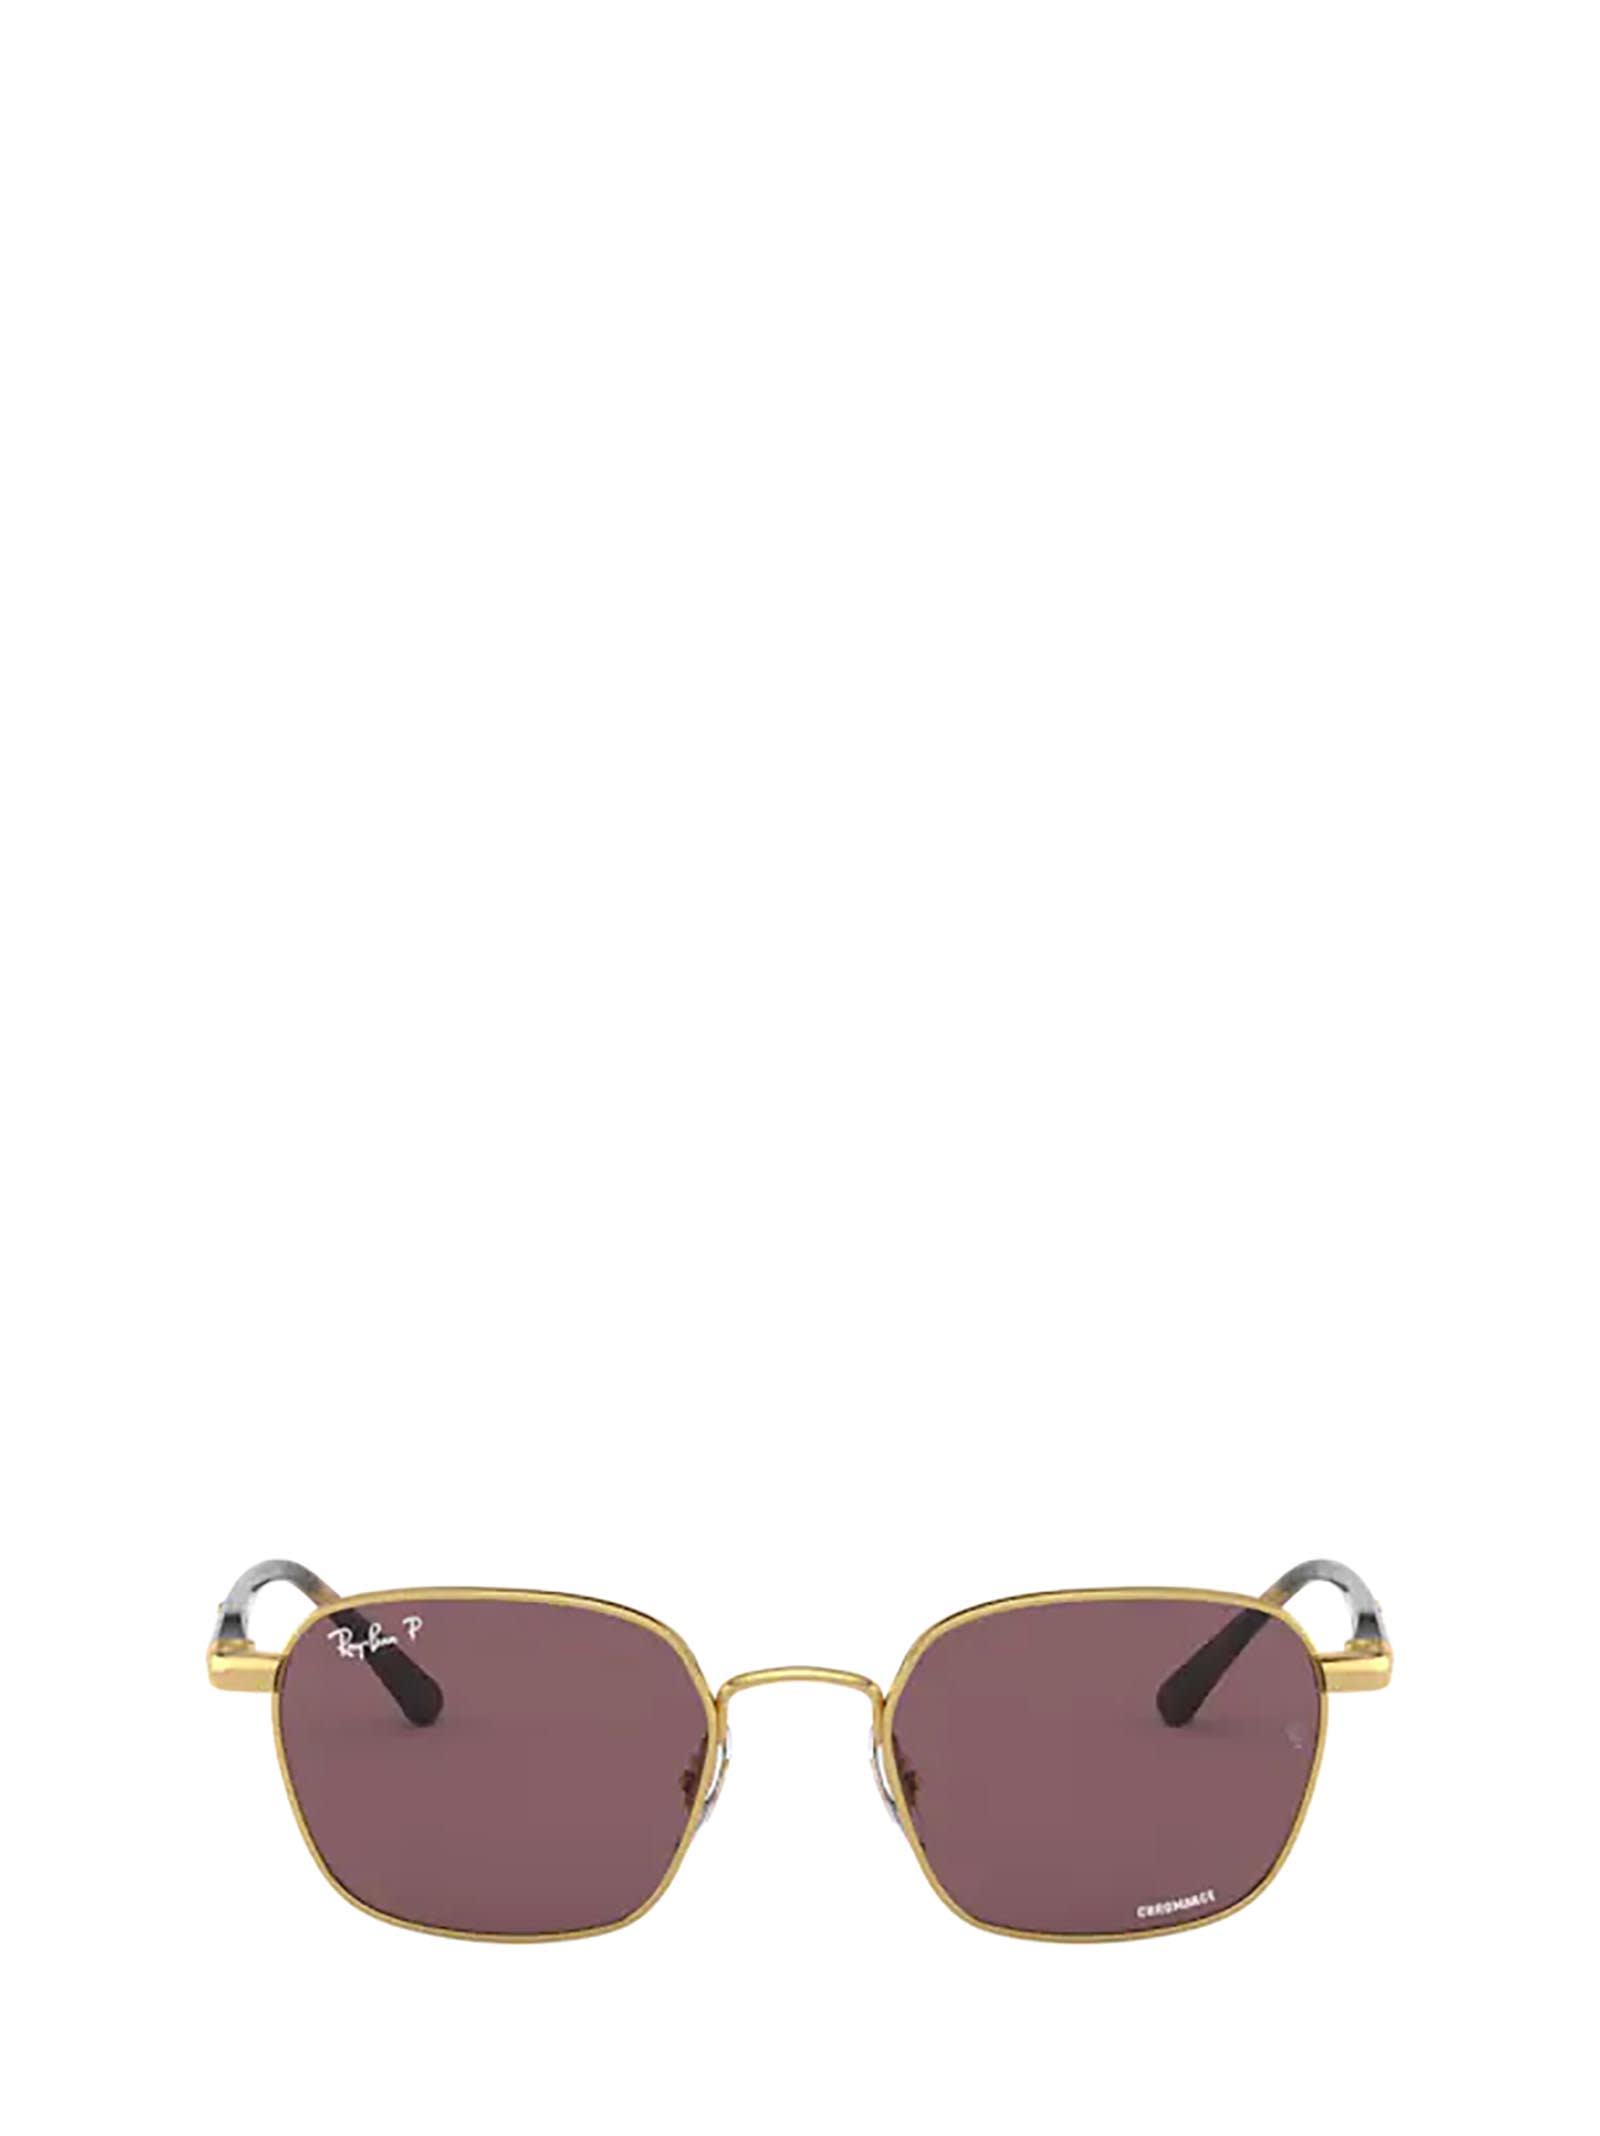 Ray-Ban Ray-ban Rb3664ch Arista Sunglasses